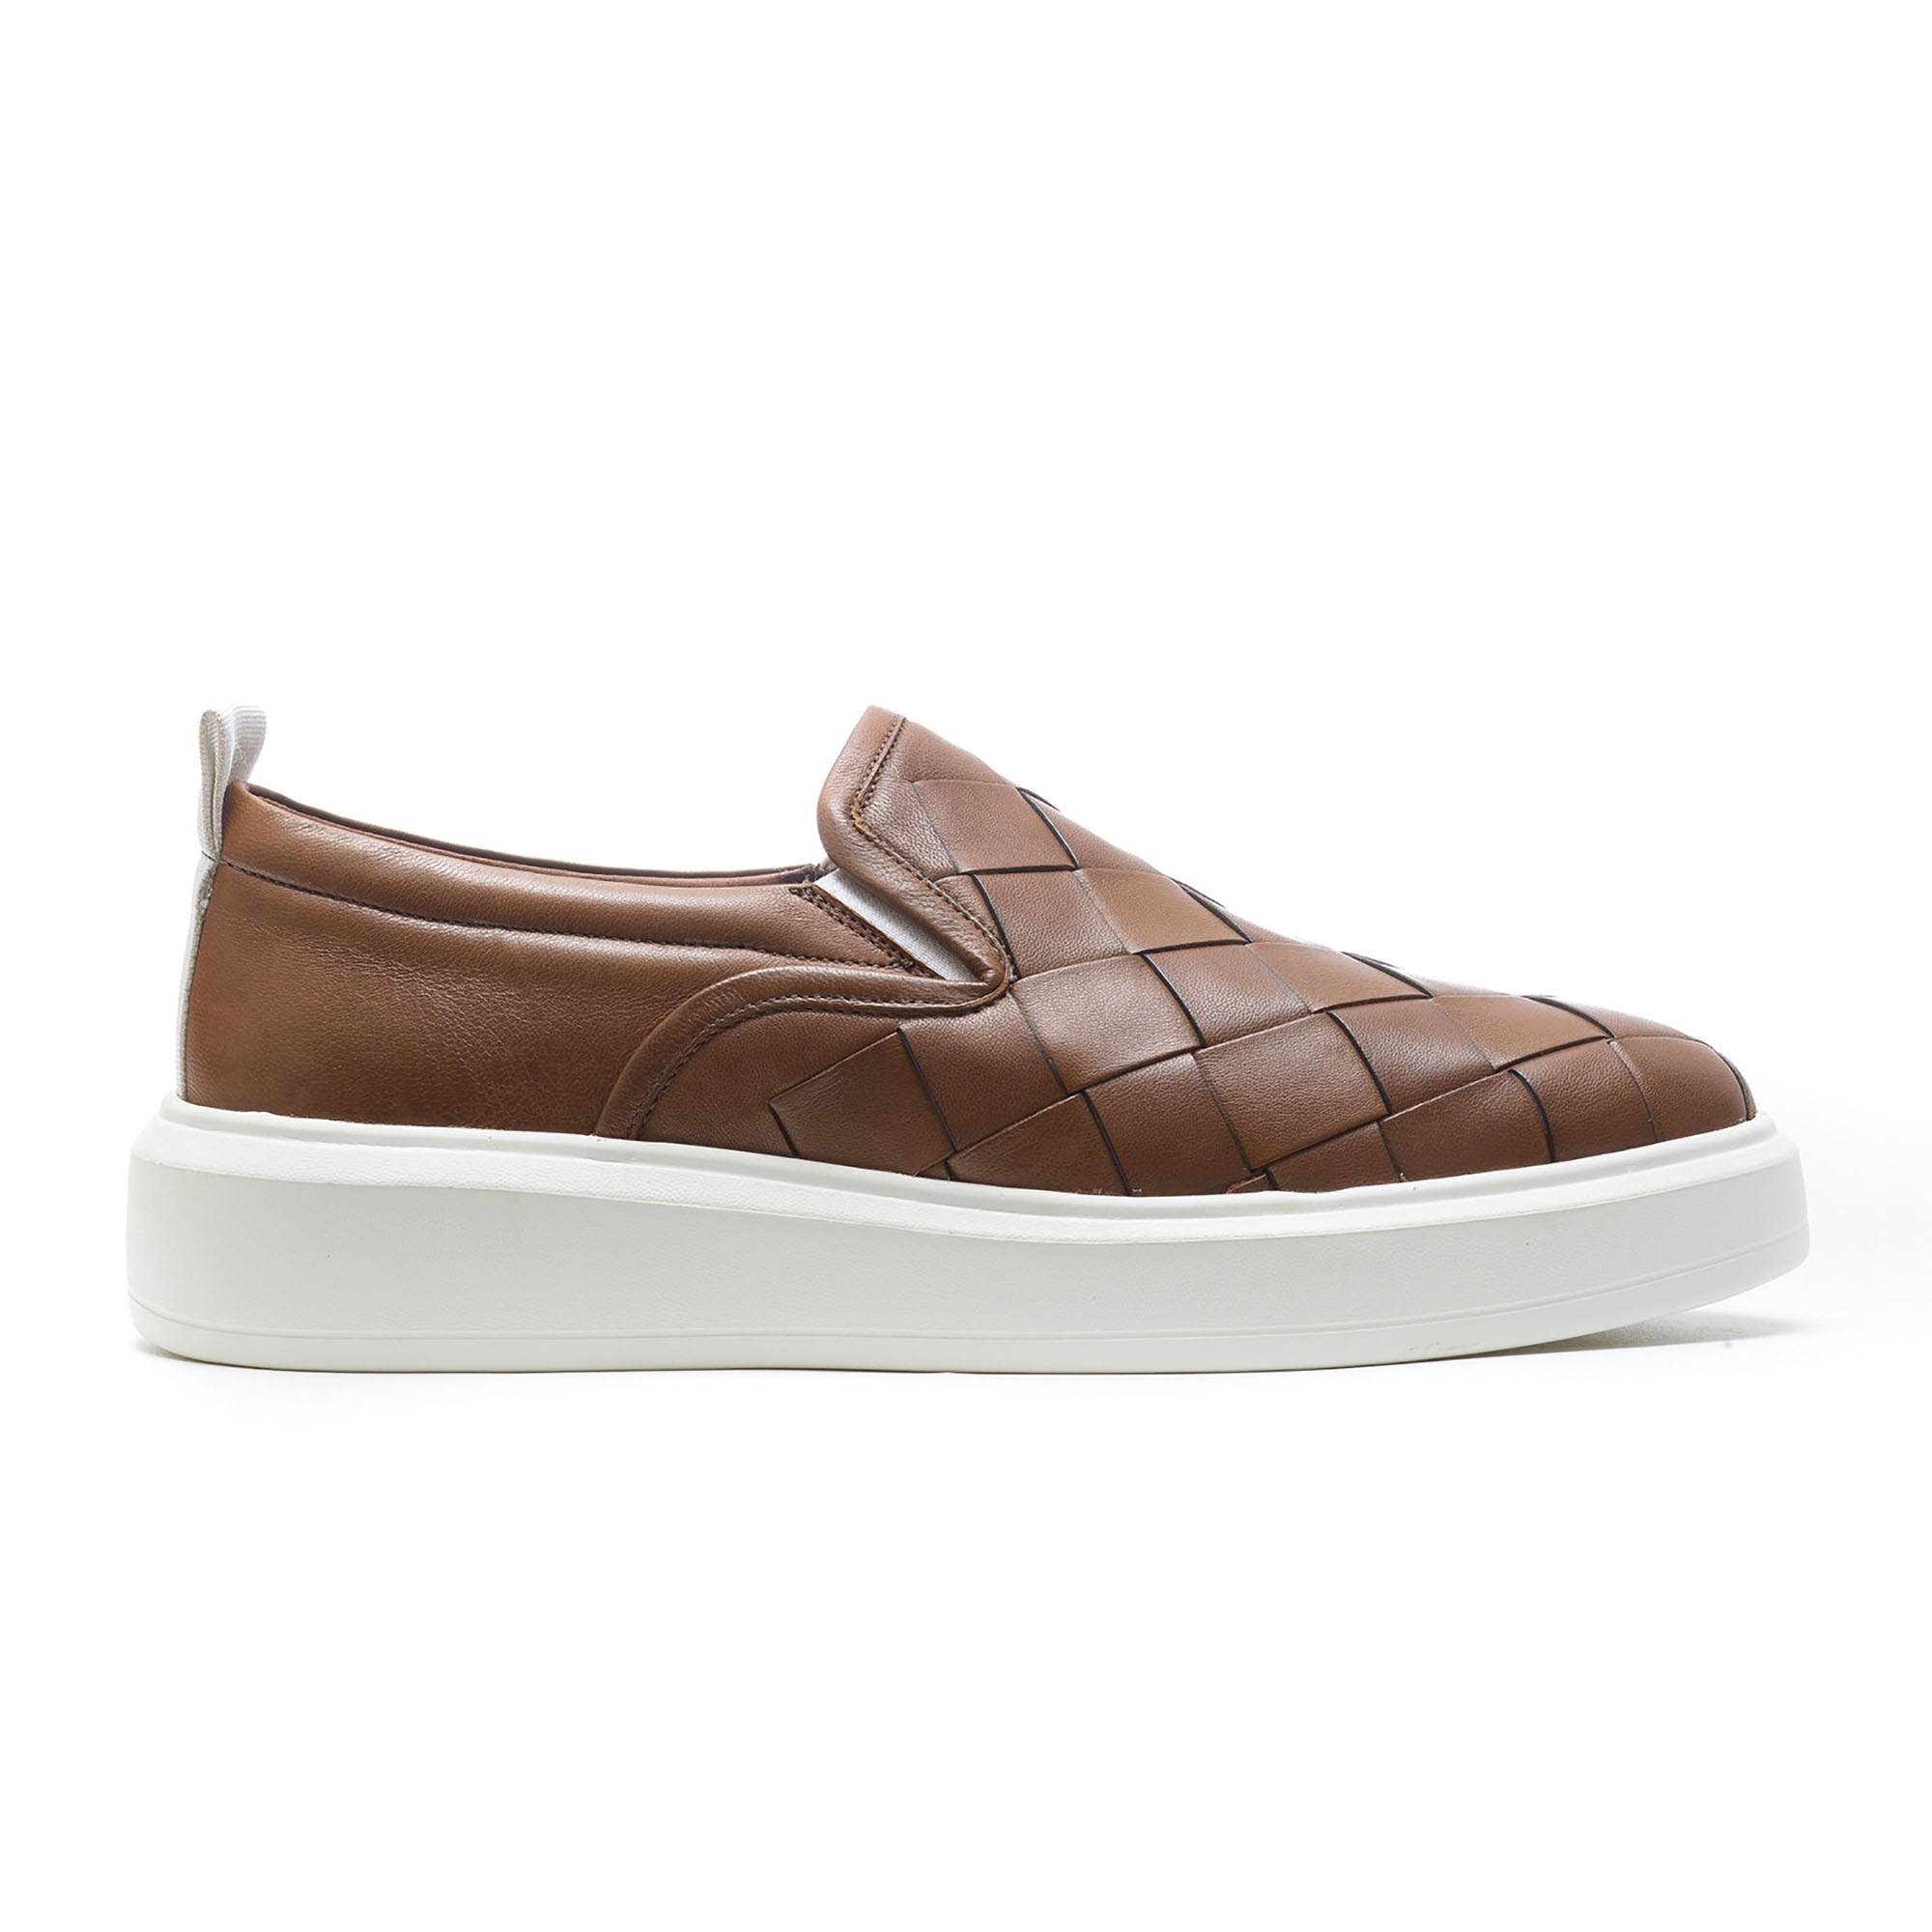 Sneaker Masculino Casual Romeu Marrom